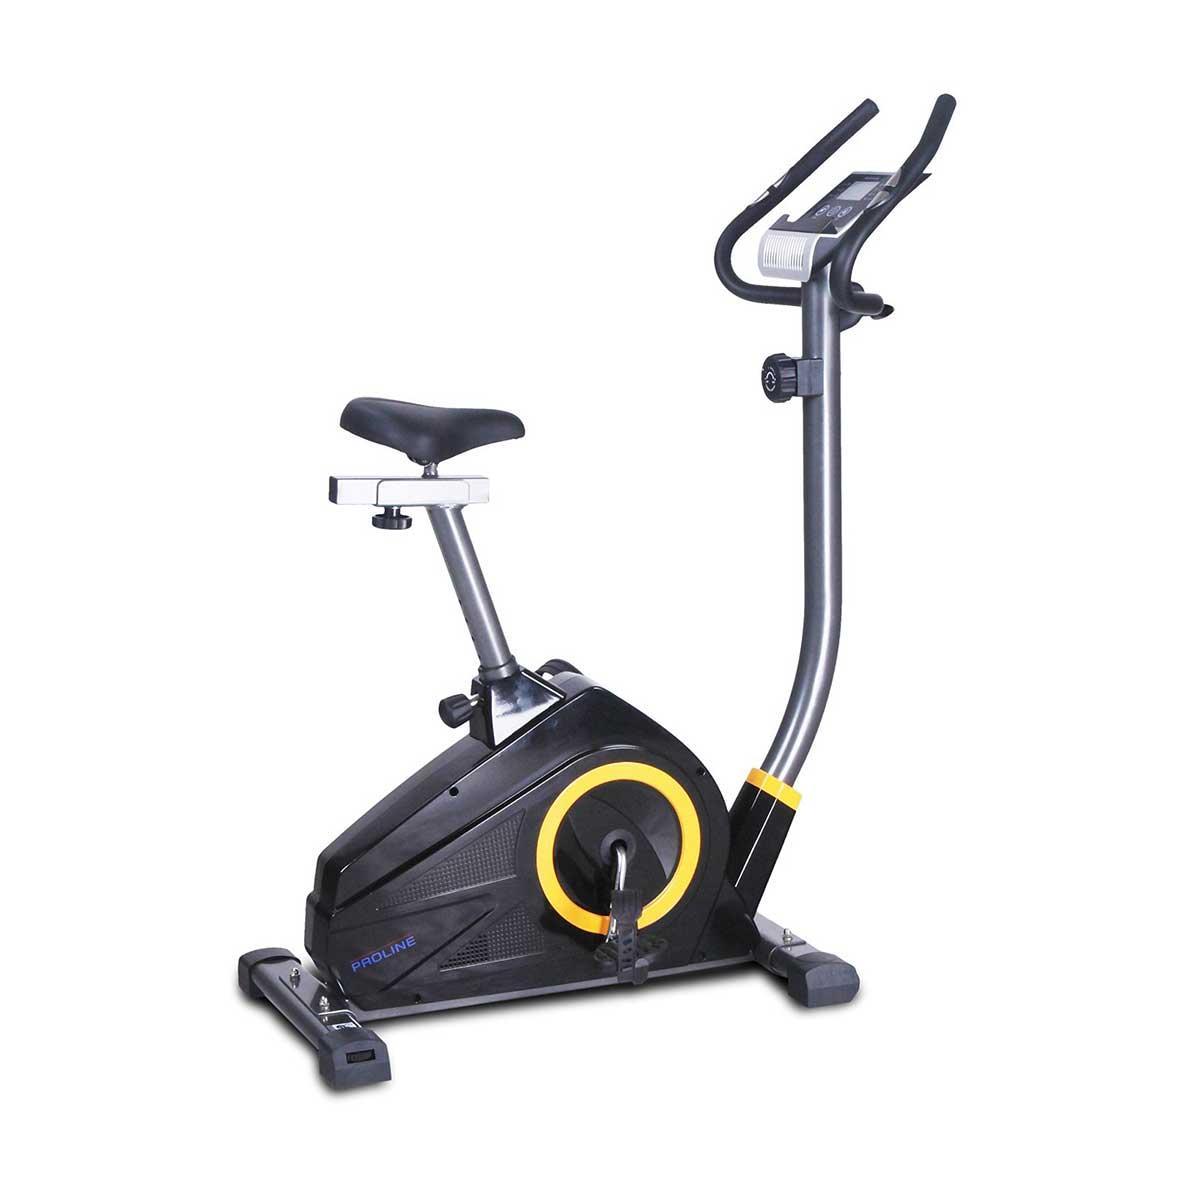 Proline Fitness 335L